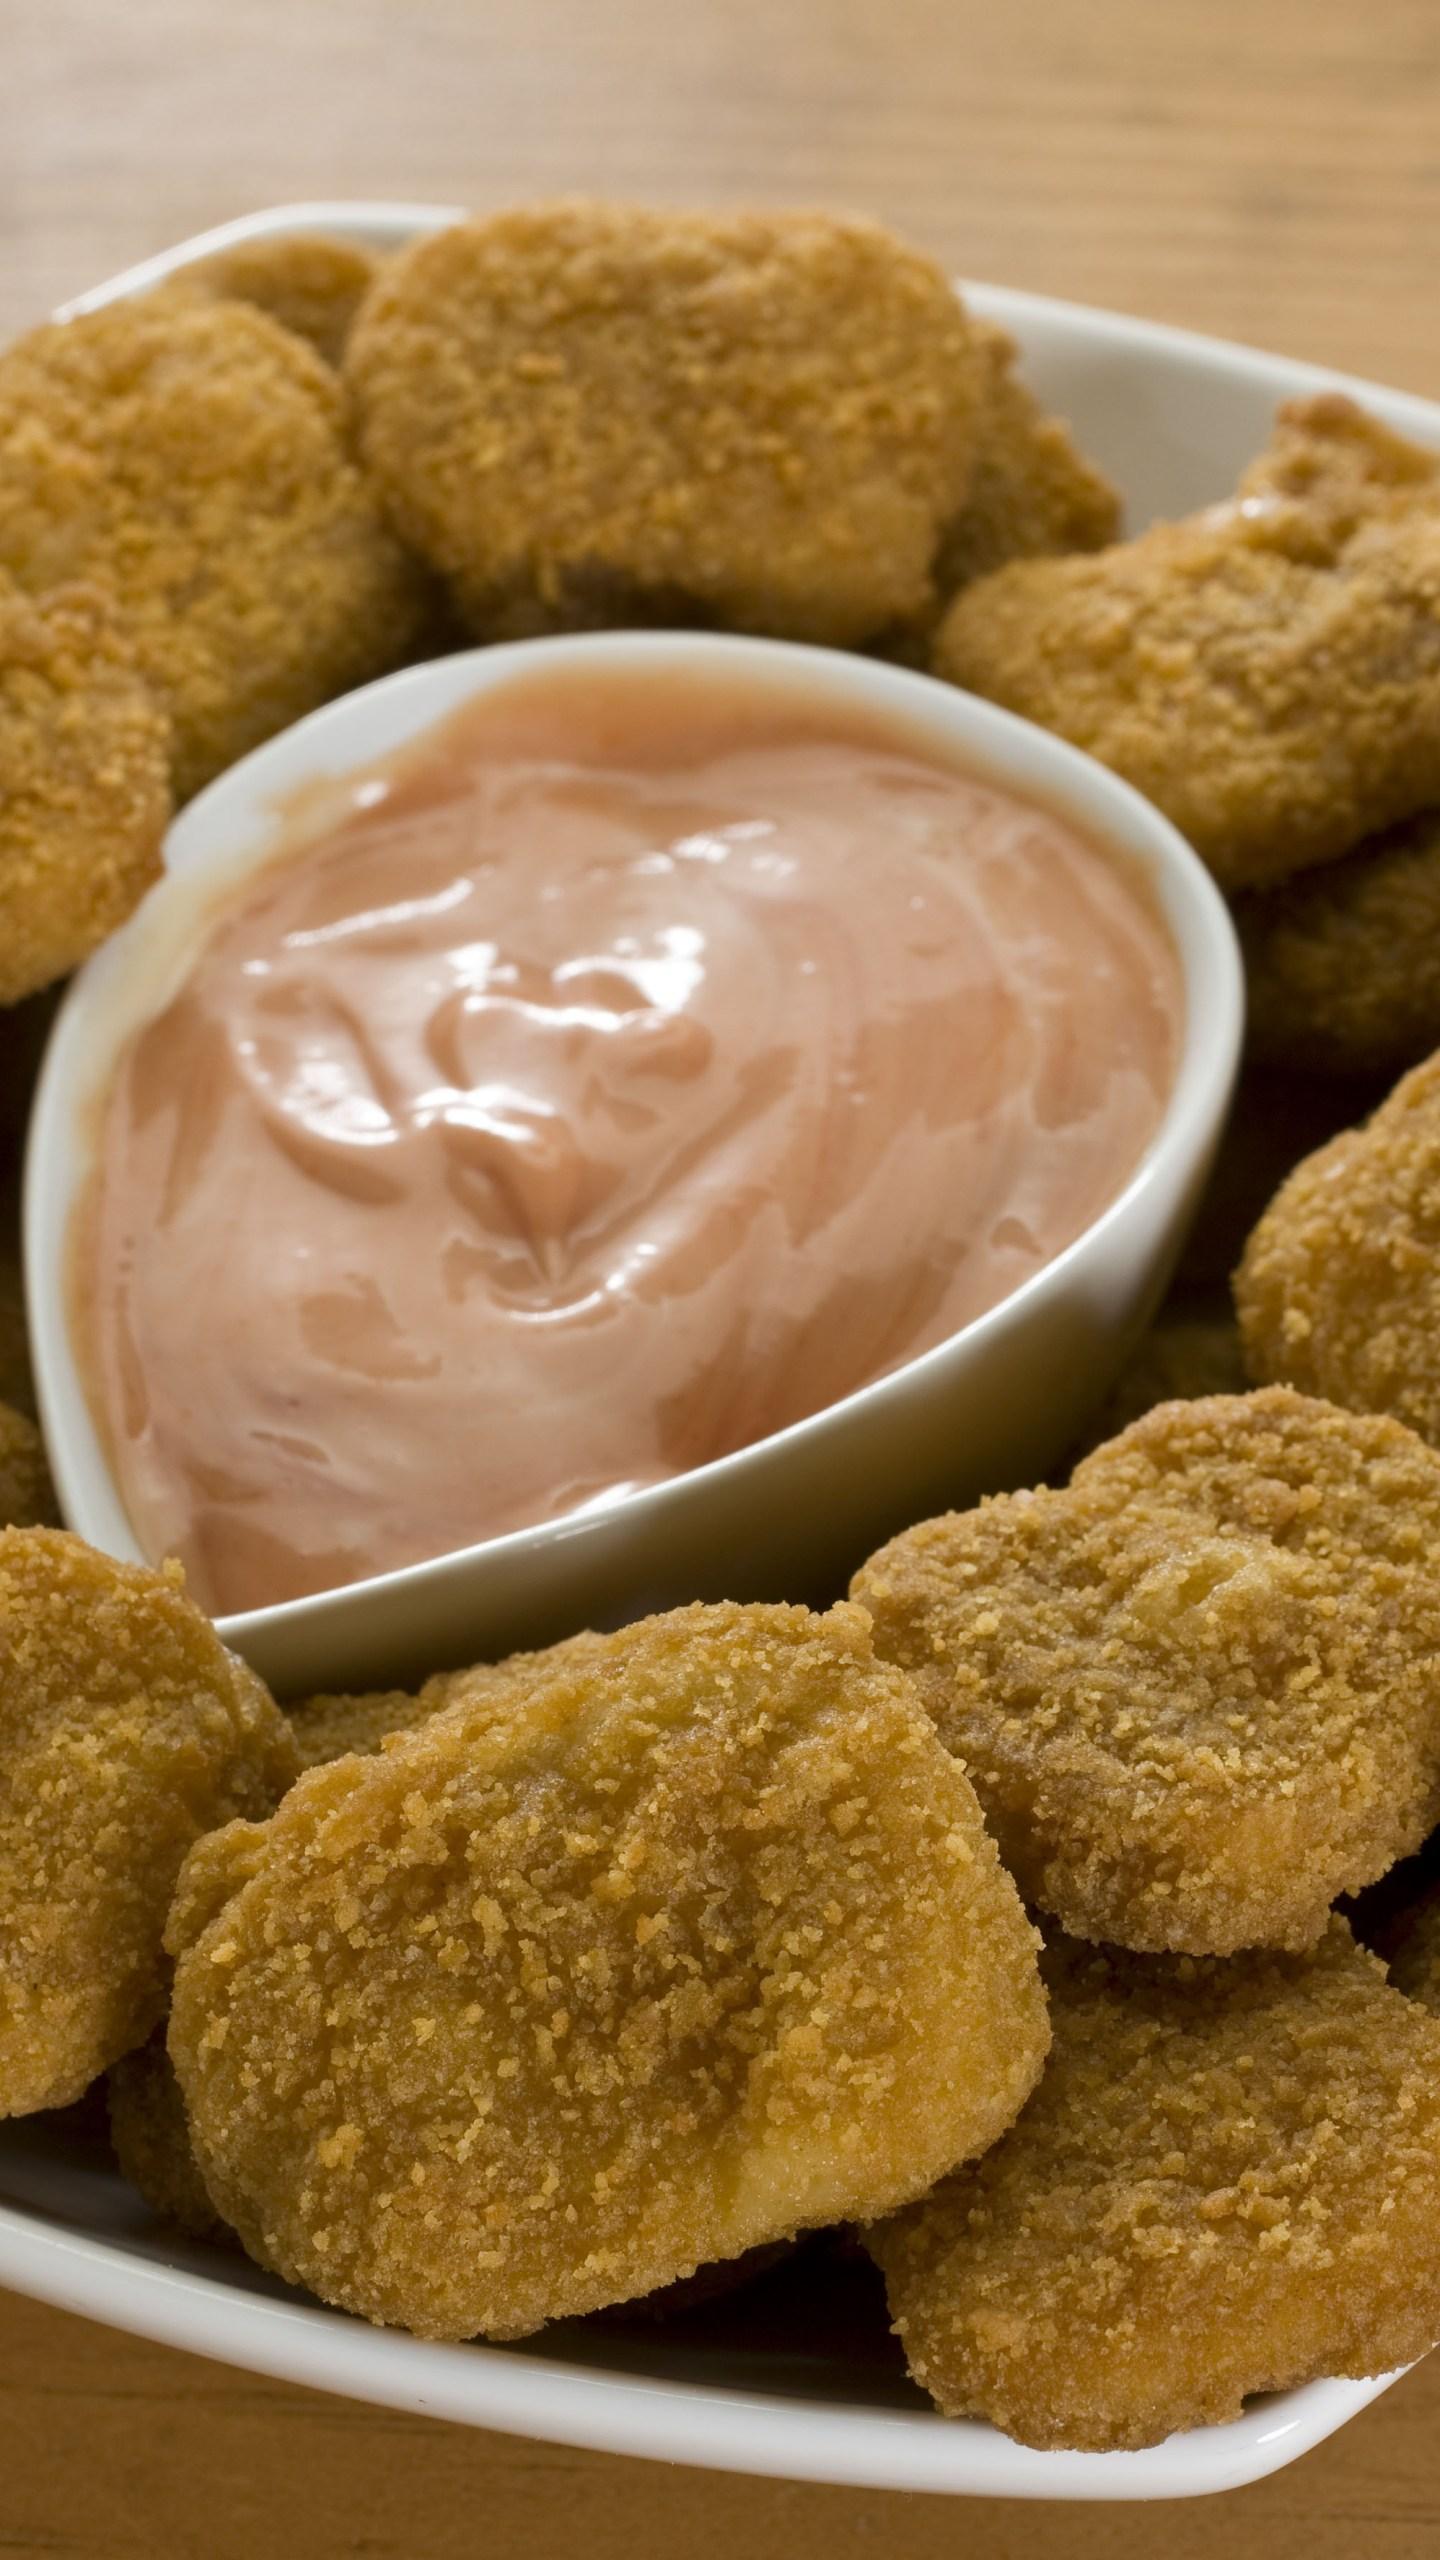 Food Chicken Nuggets_1547837151220